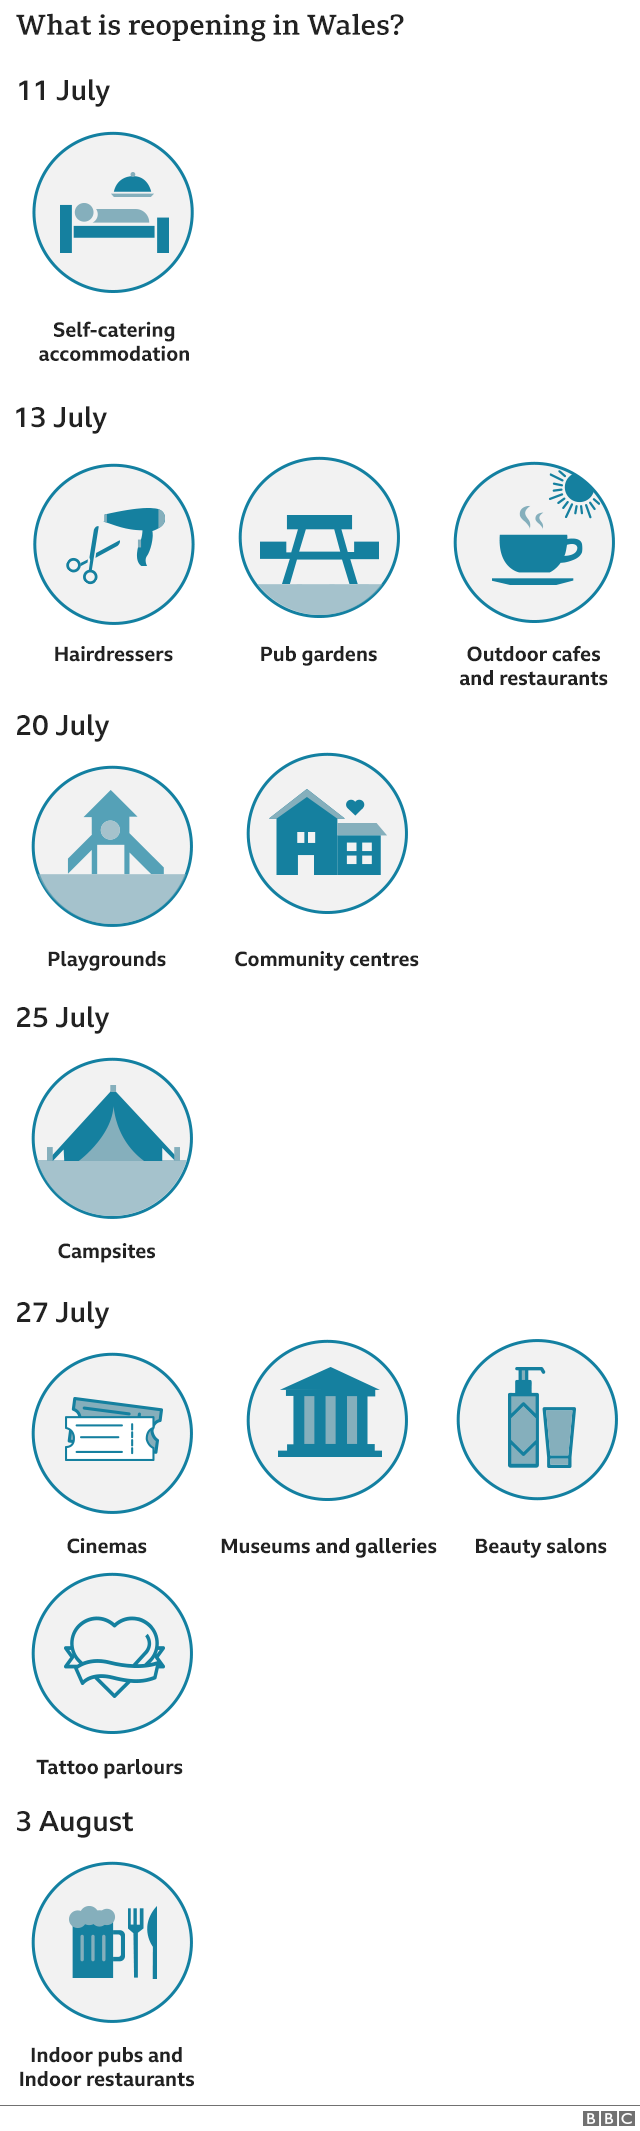 List of lockdown dates